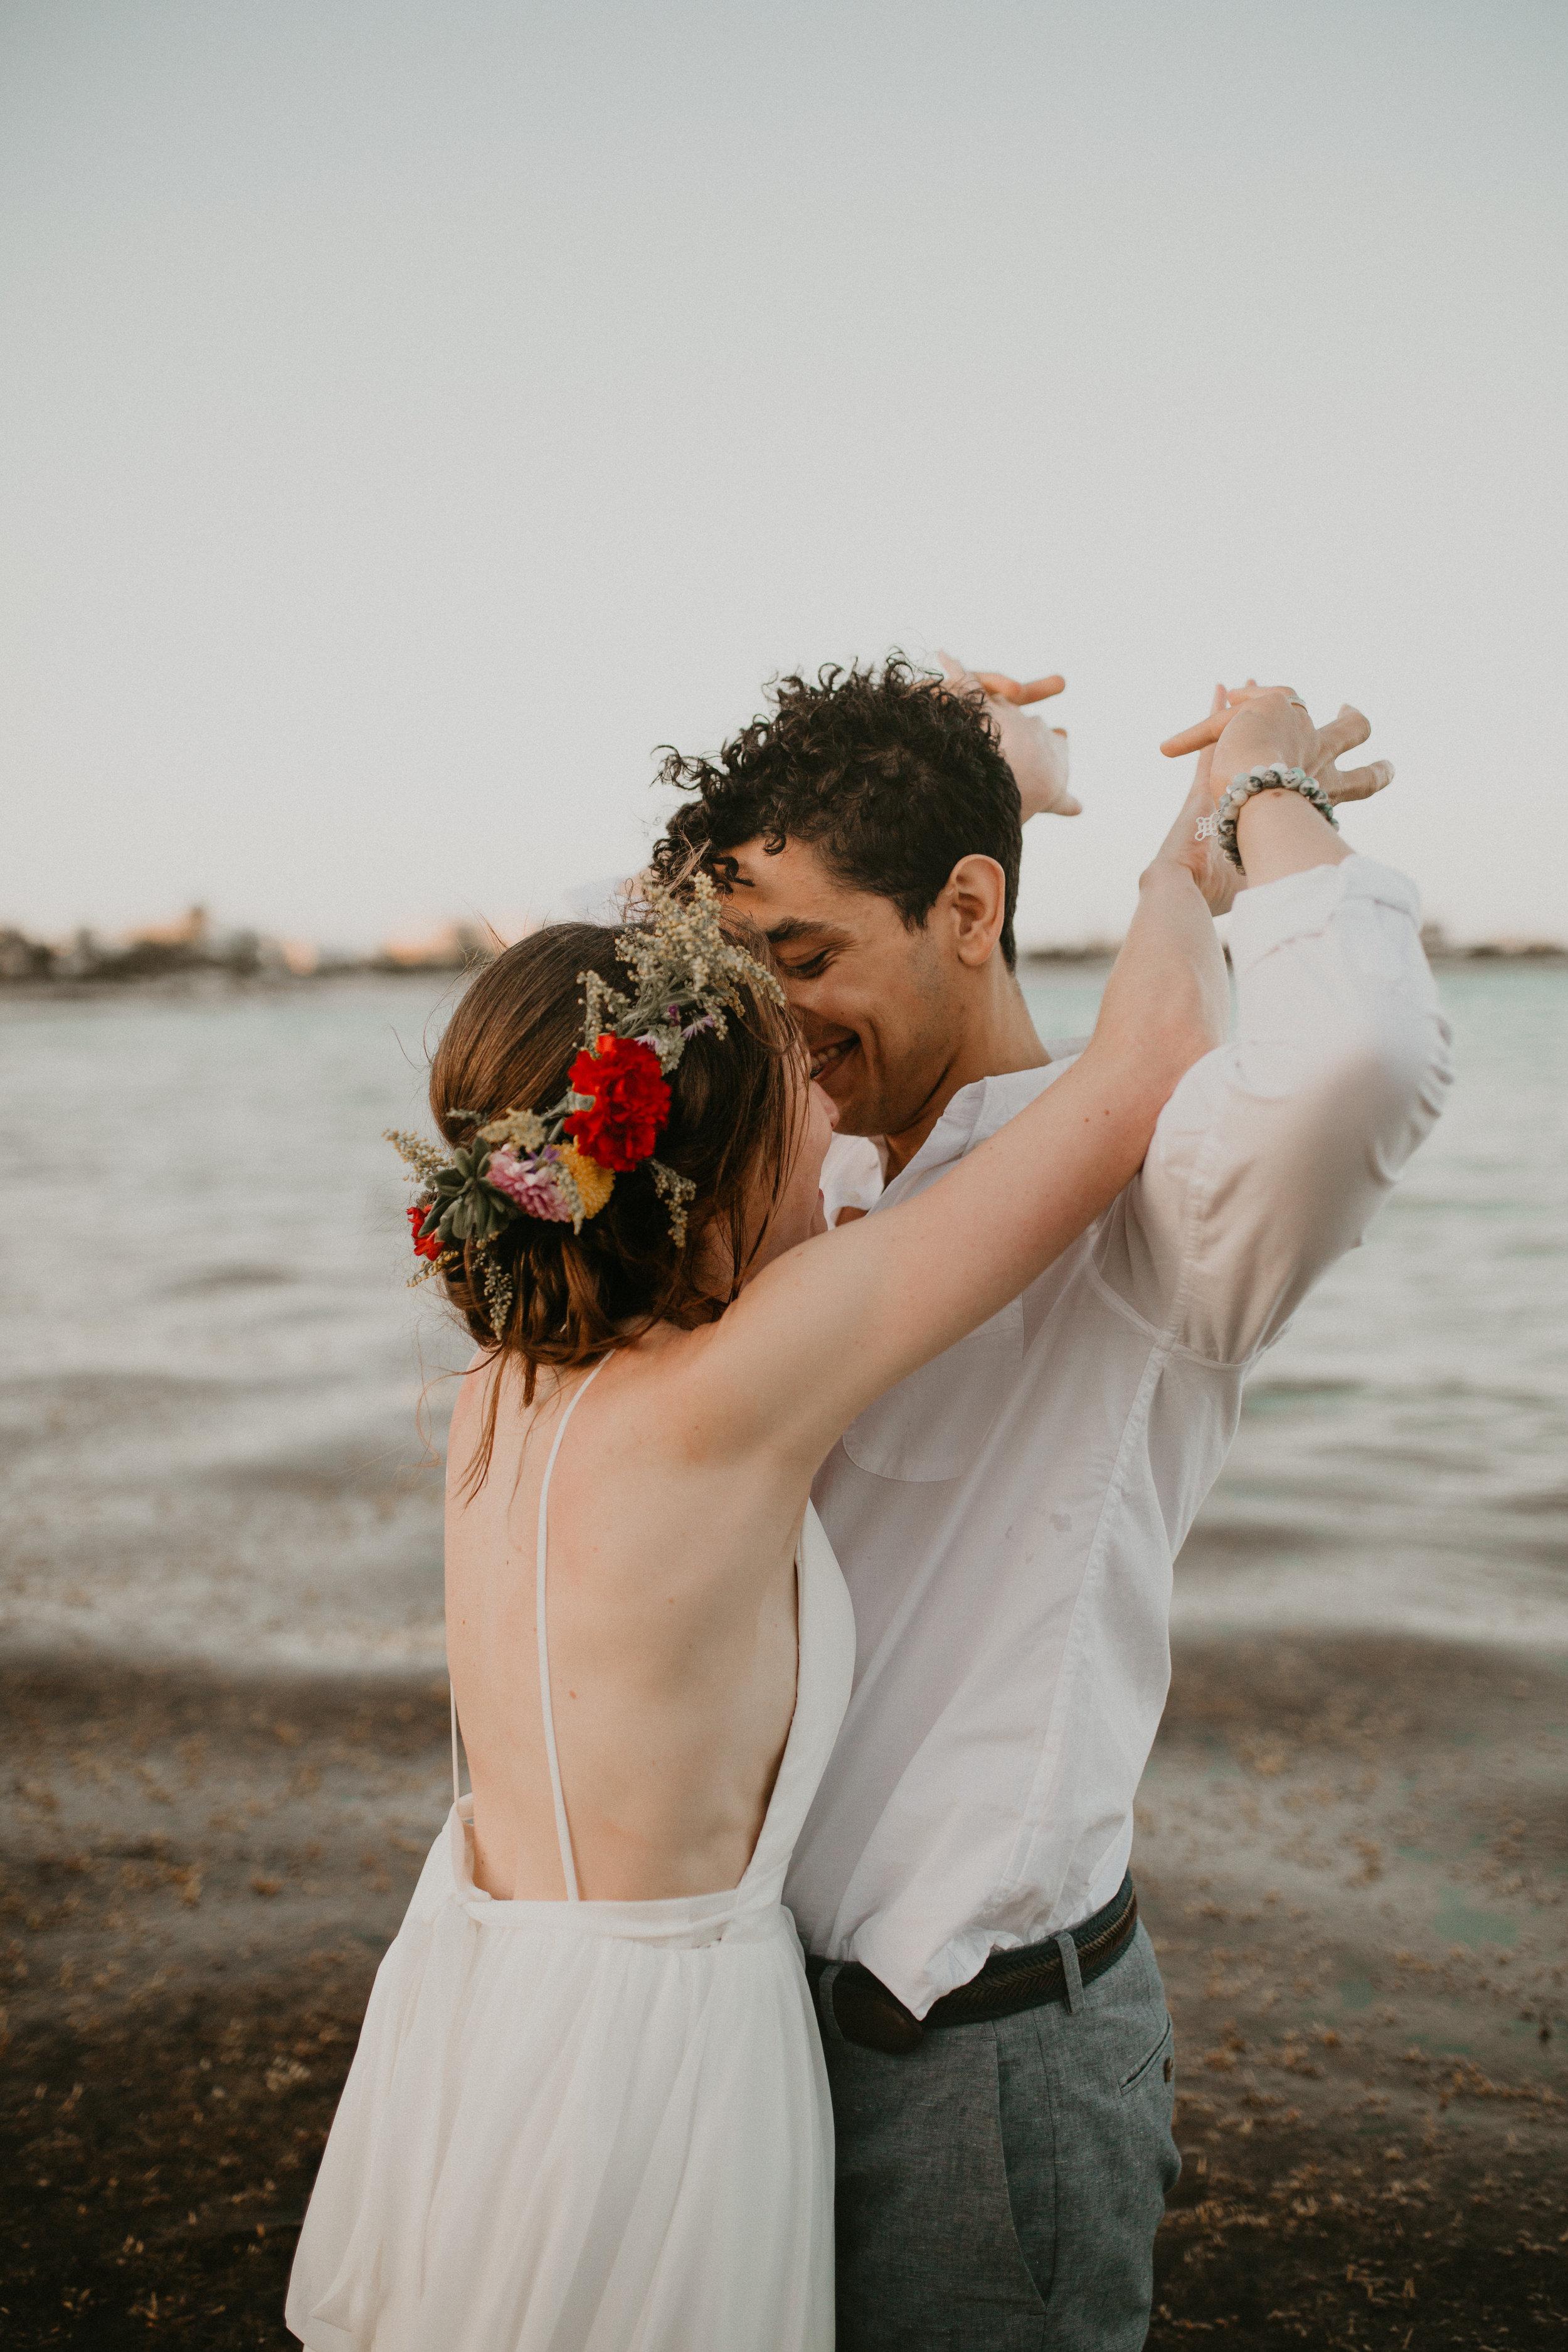 Nicole-Daacke-Photography-beachfront-akumal-destionation-wedding-tulum-mexico-elopement-photographer-destination-wedding-inspiration-sunset-champagne-pop-boho-bride-ocean-tropical-bohemian-tulum-wedding-photos-203.jpg